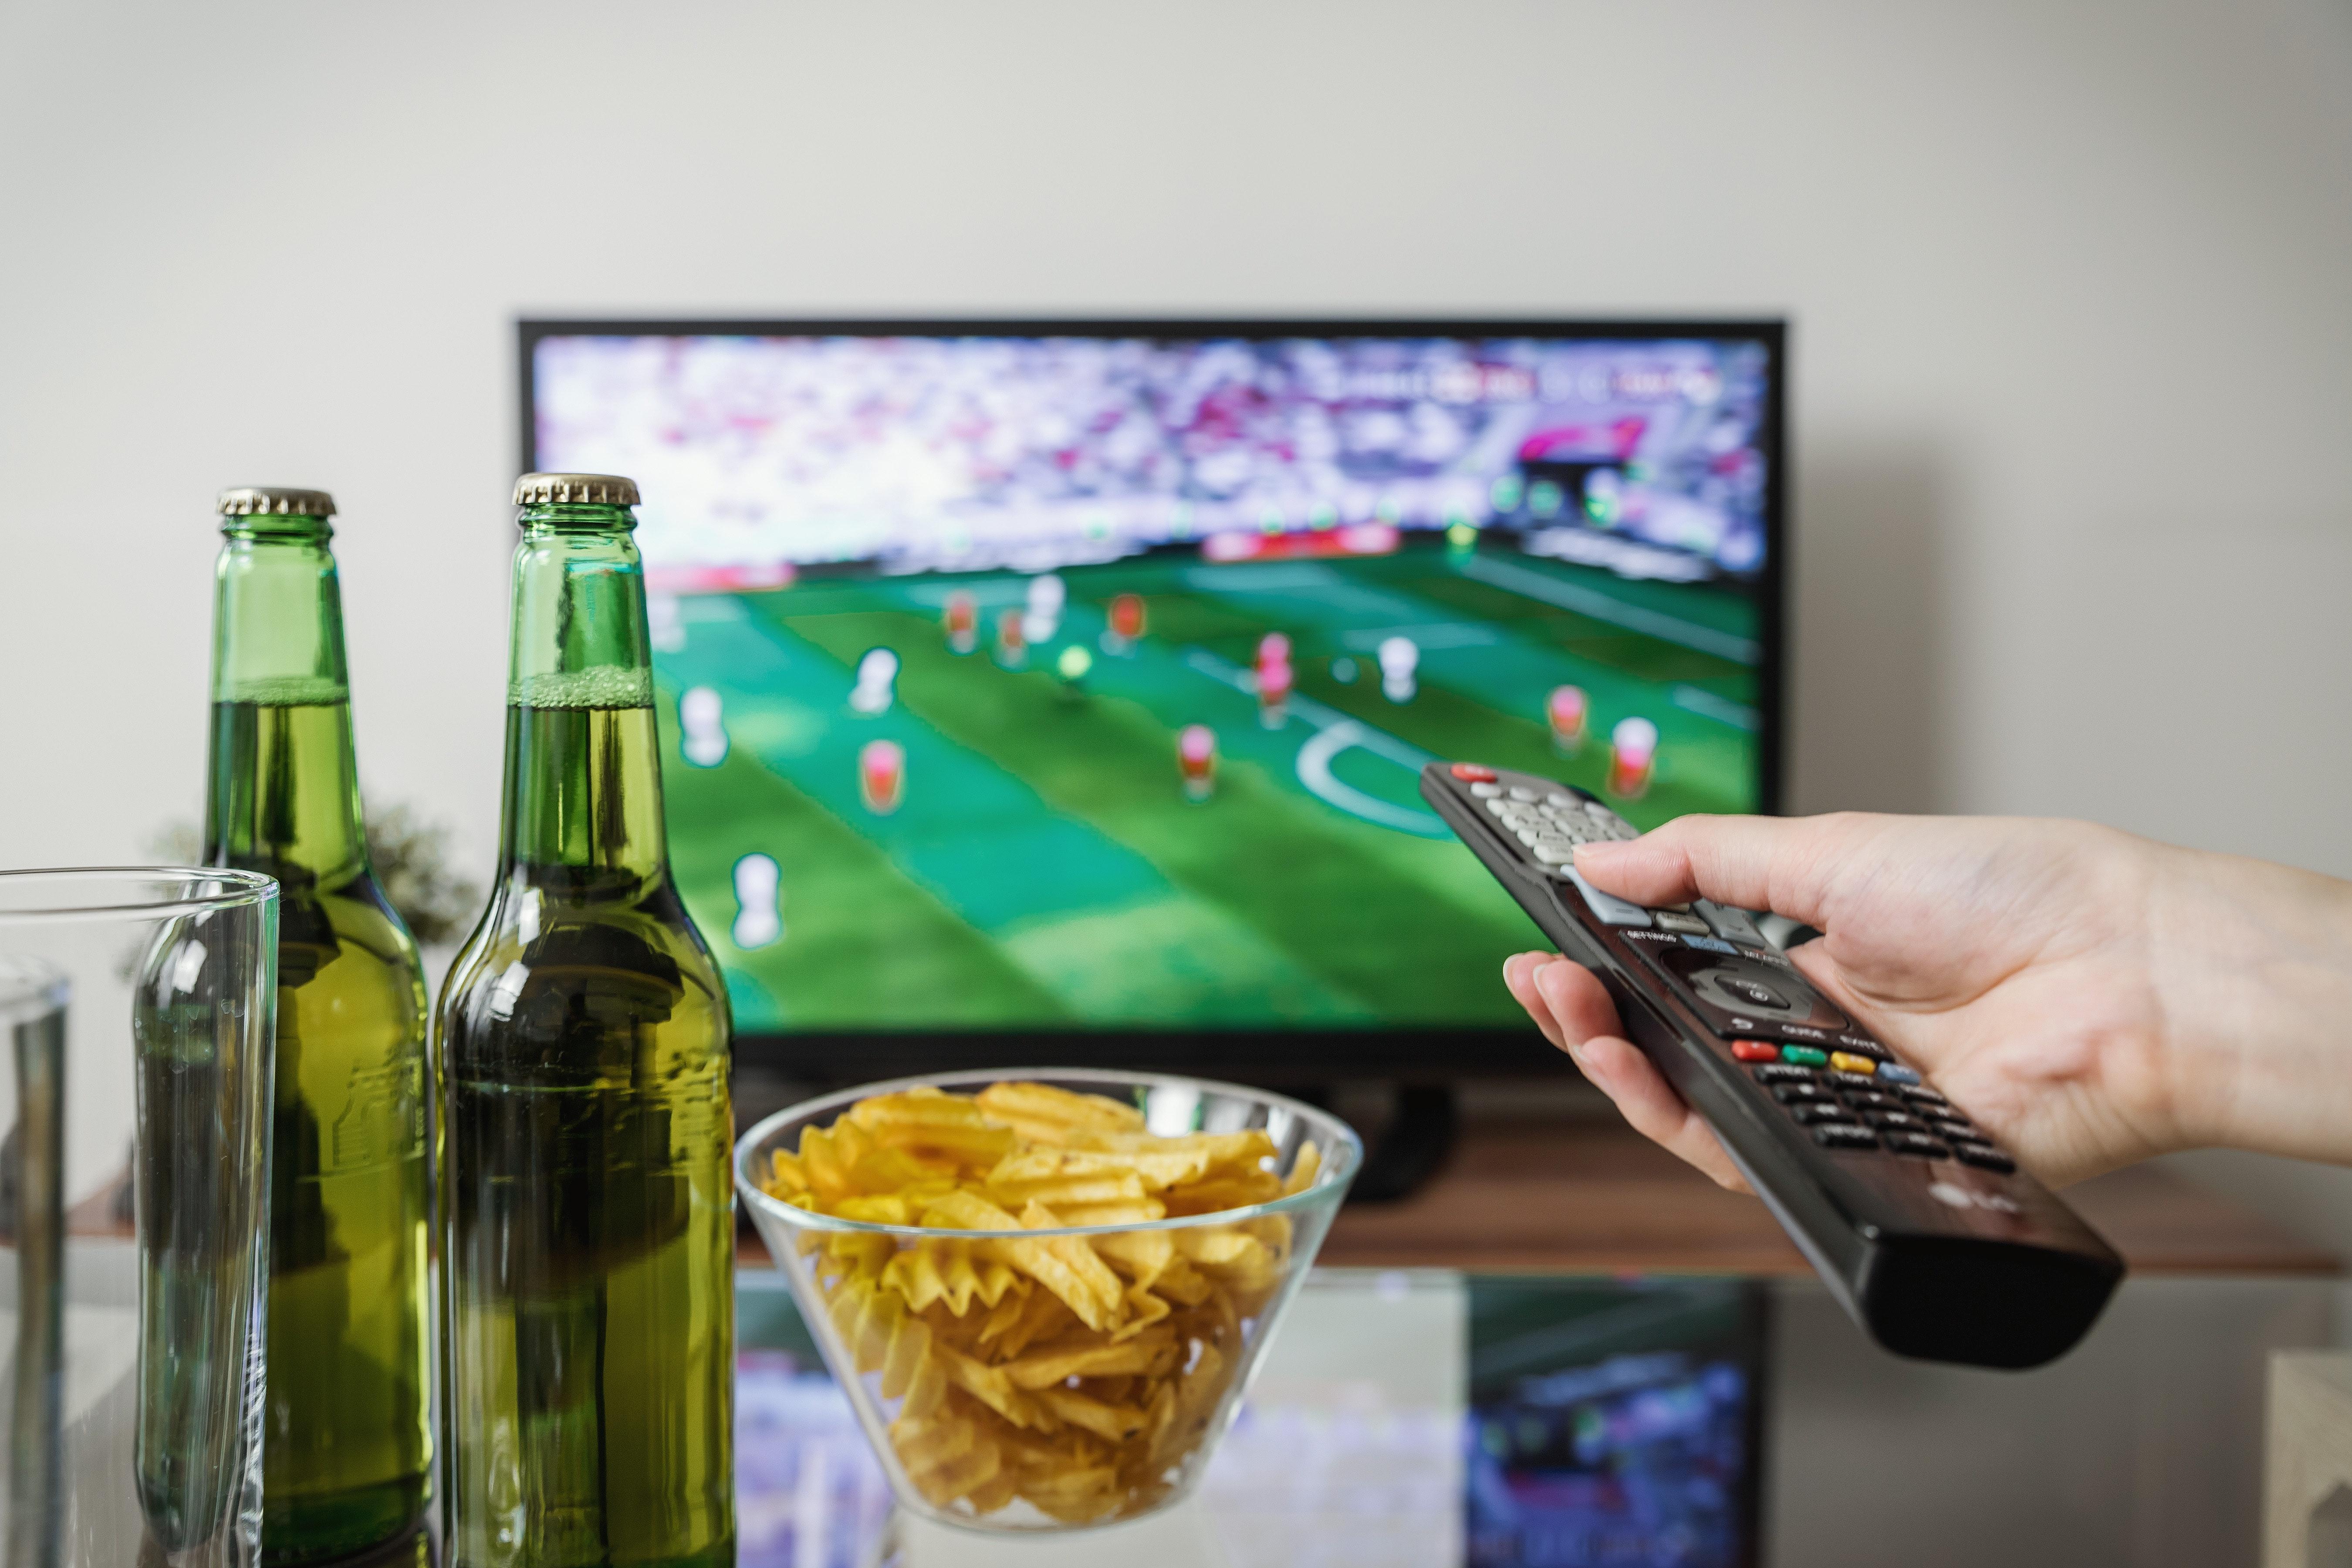 Redstreamsport e le altre piattaforme streaming